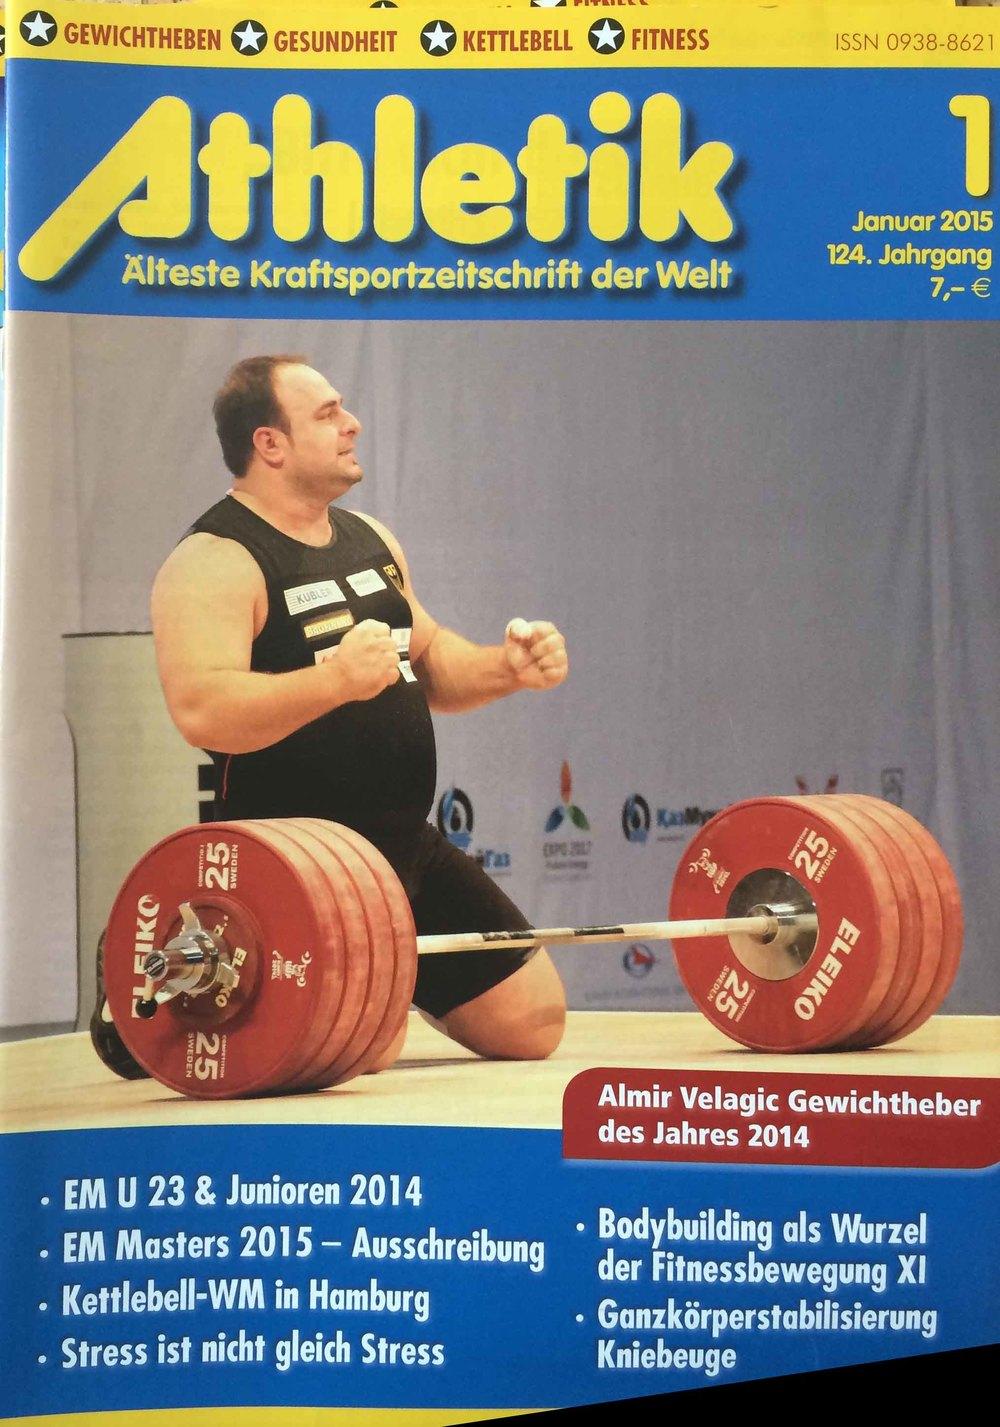 Kettlebell World Championship Hamburg